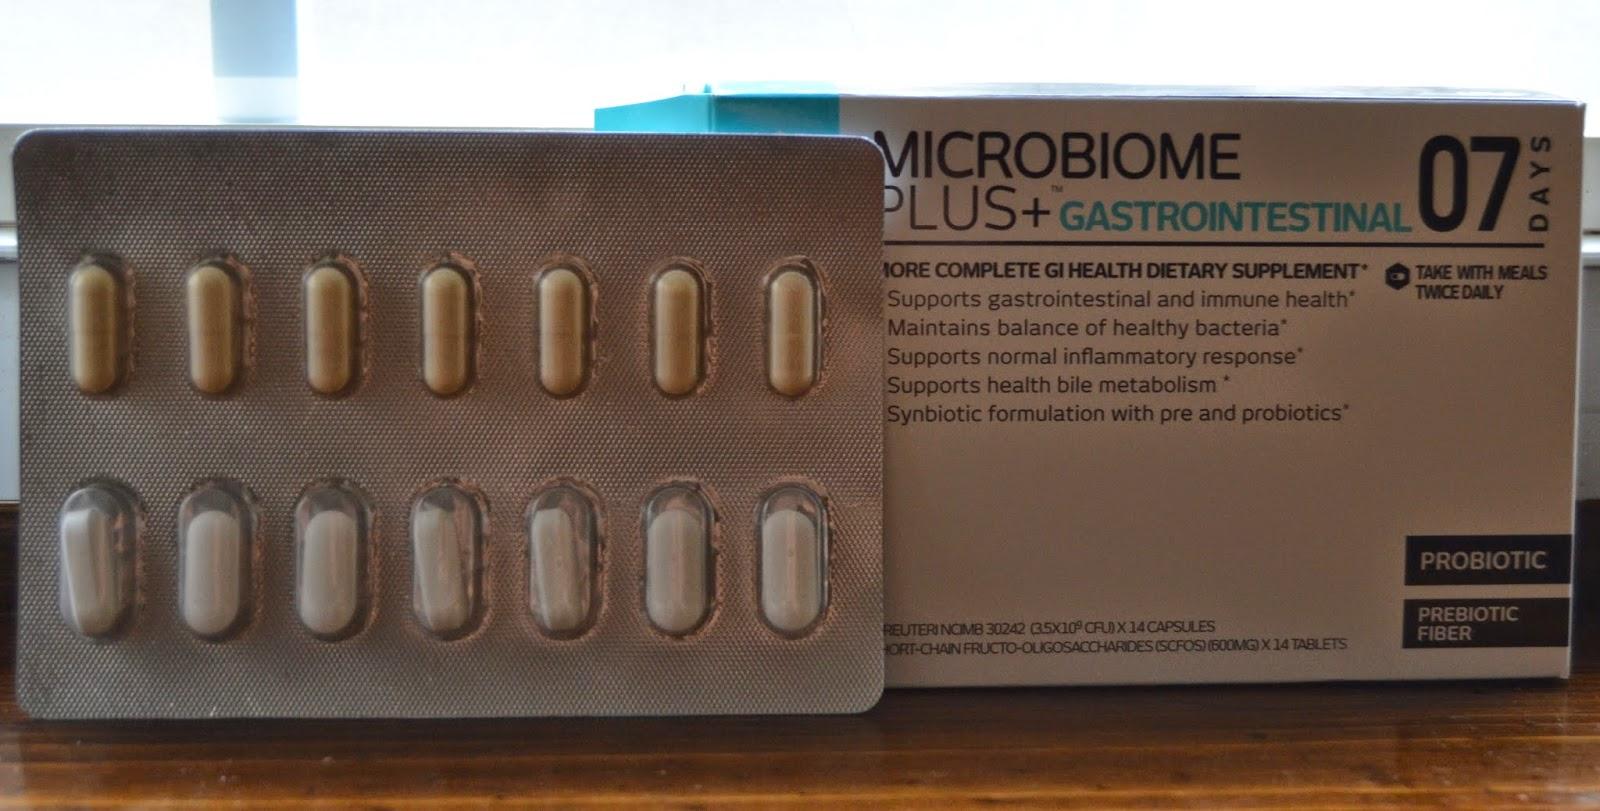 Microbiome Plus+ GI Probiotics